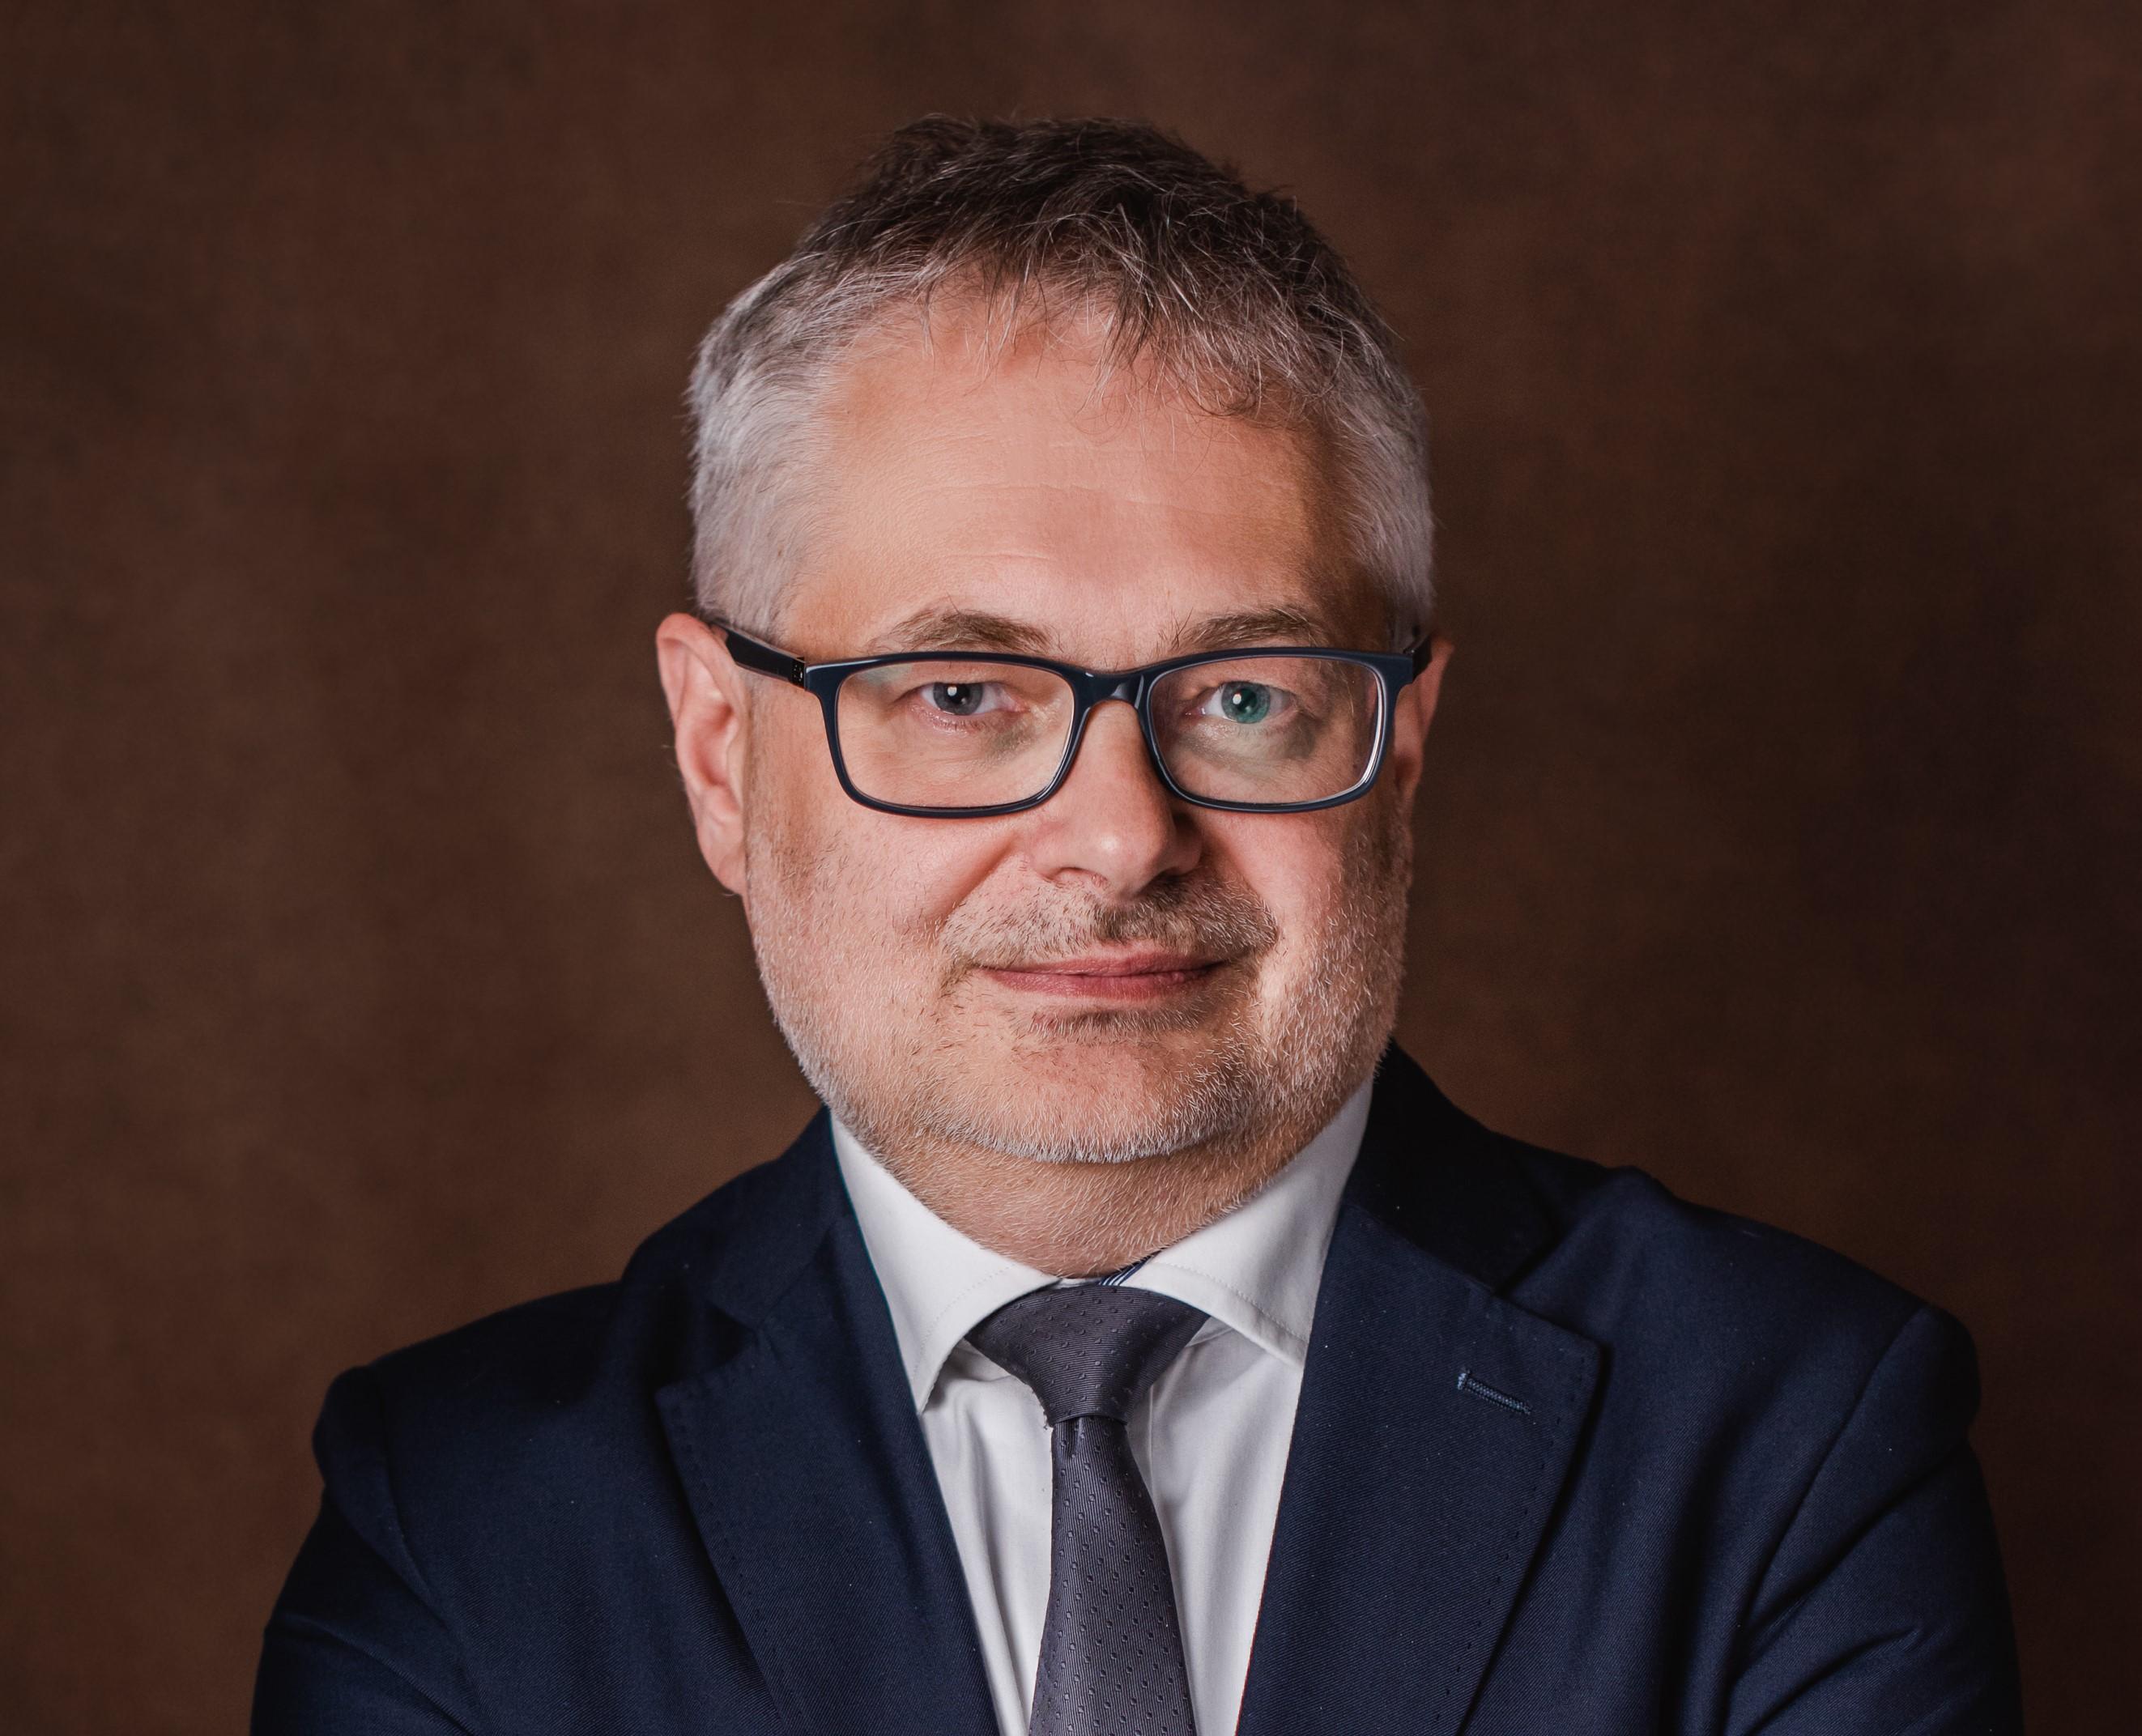 Artur Merchut, szef Biura Techniczno-Projektowego FPM